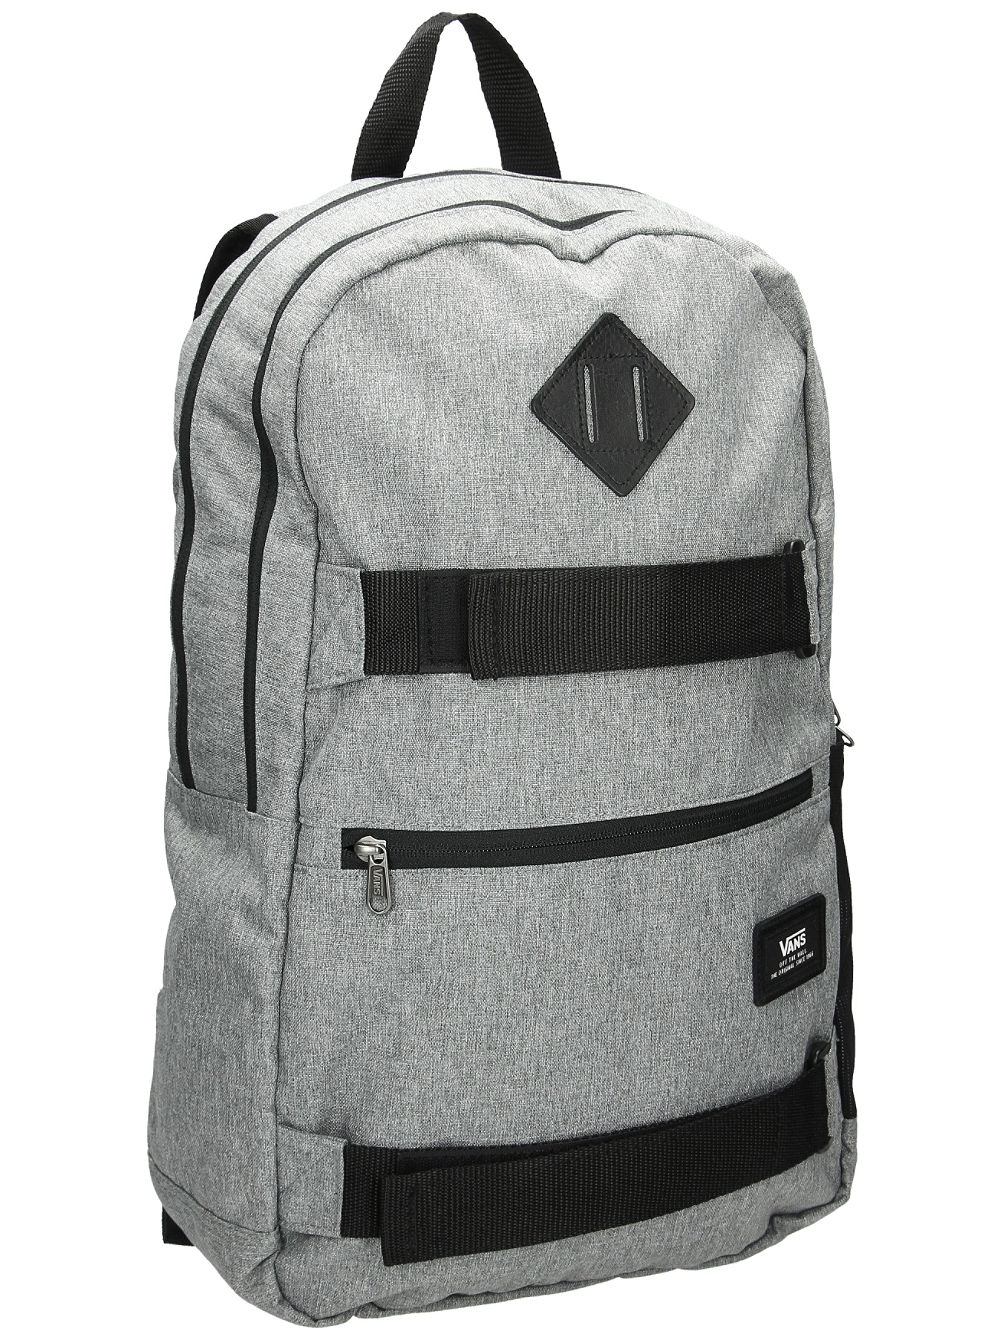 vans authentic iii skate rucksack online kaufen bei blue. Black Bedroom Furniture Sets. Home Design Ideas